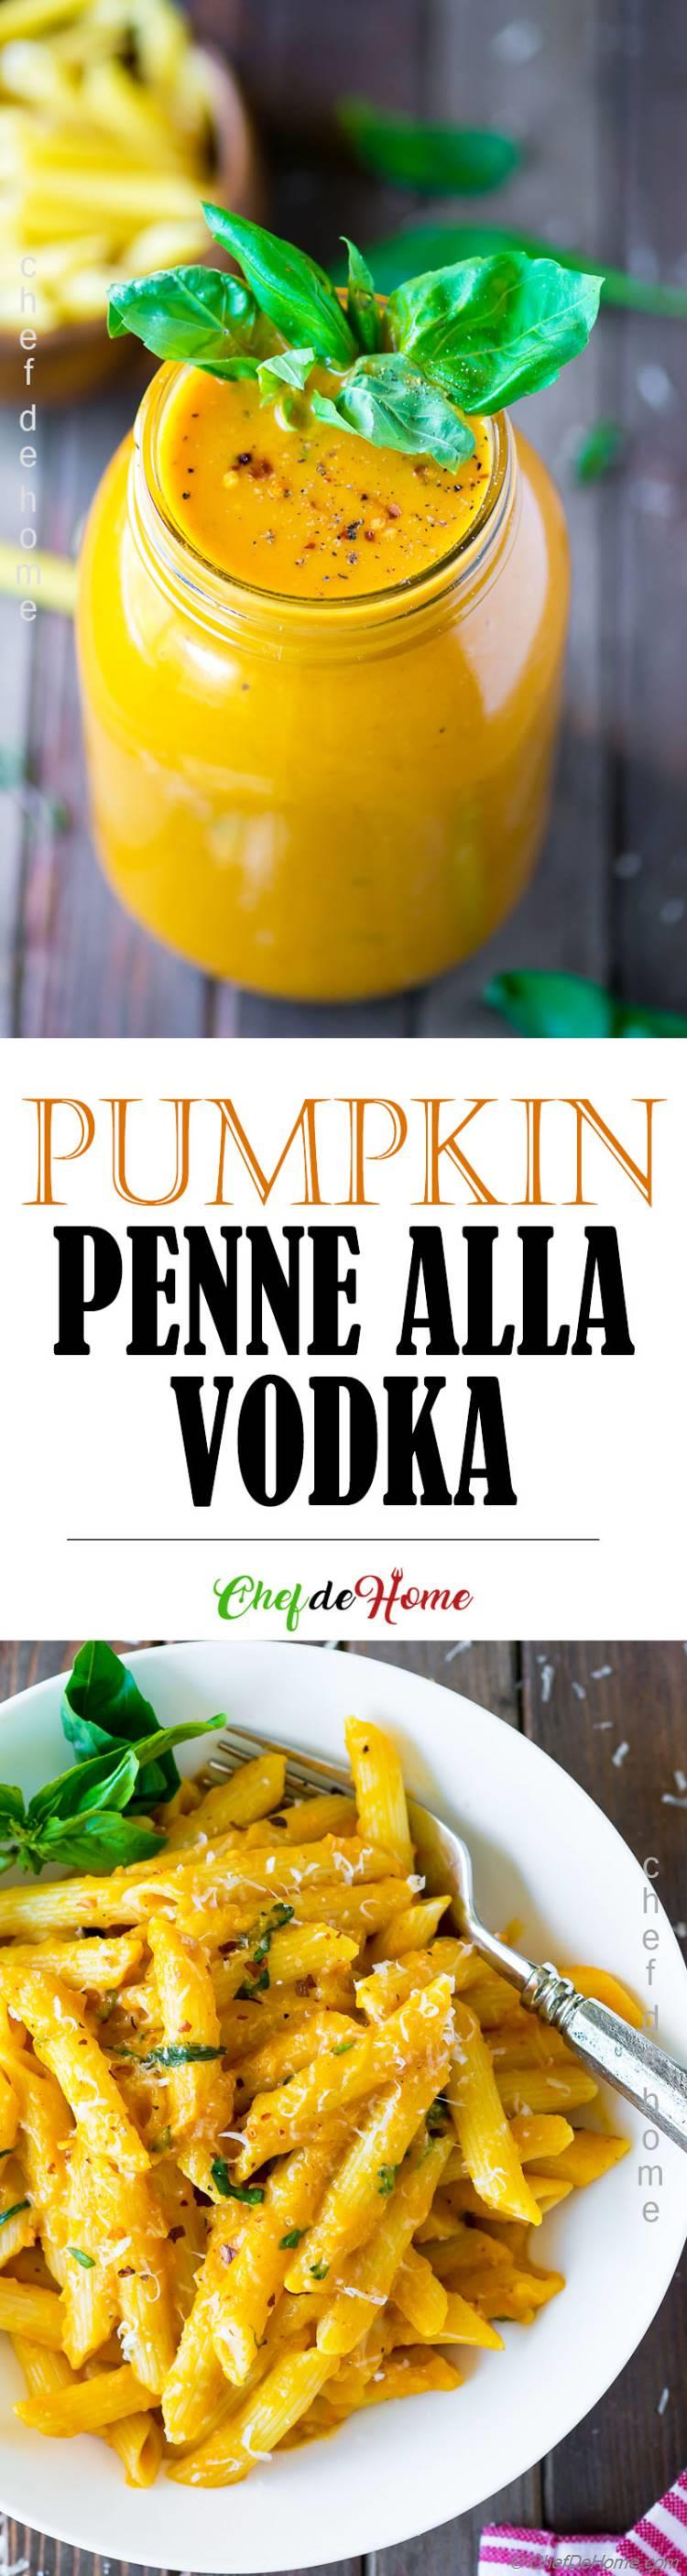 Pumpkin Vodka Sauce Pasta